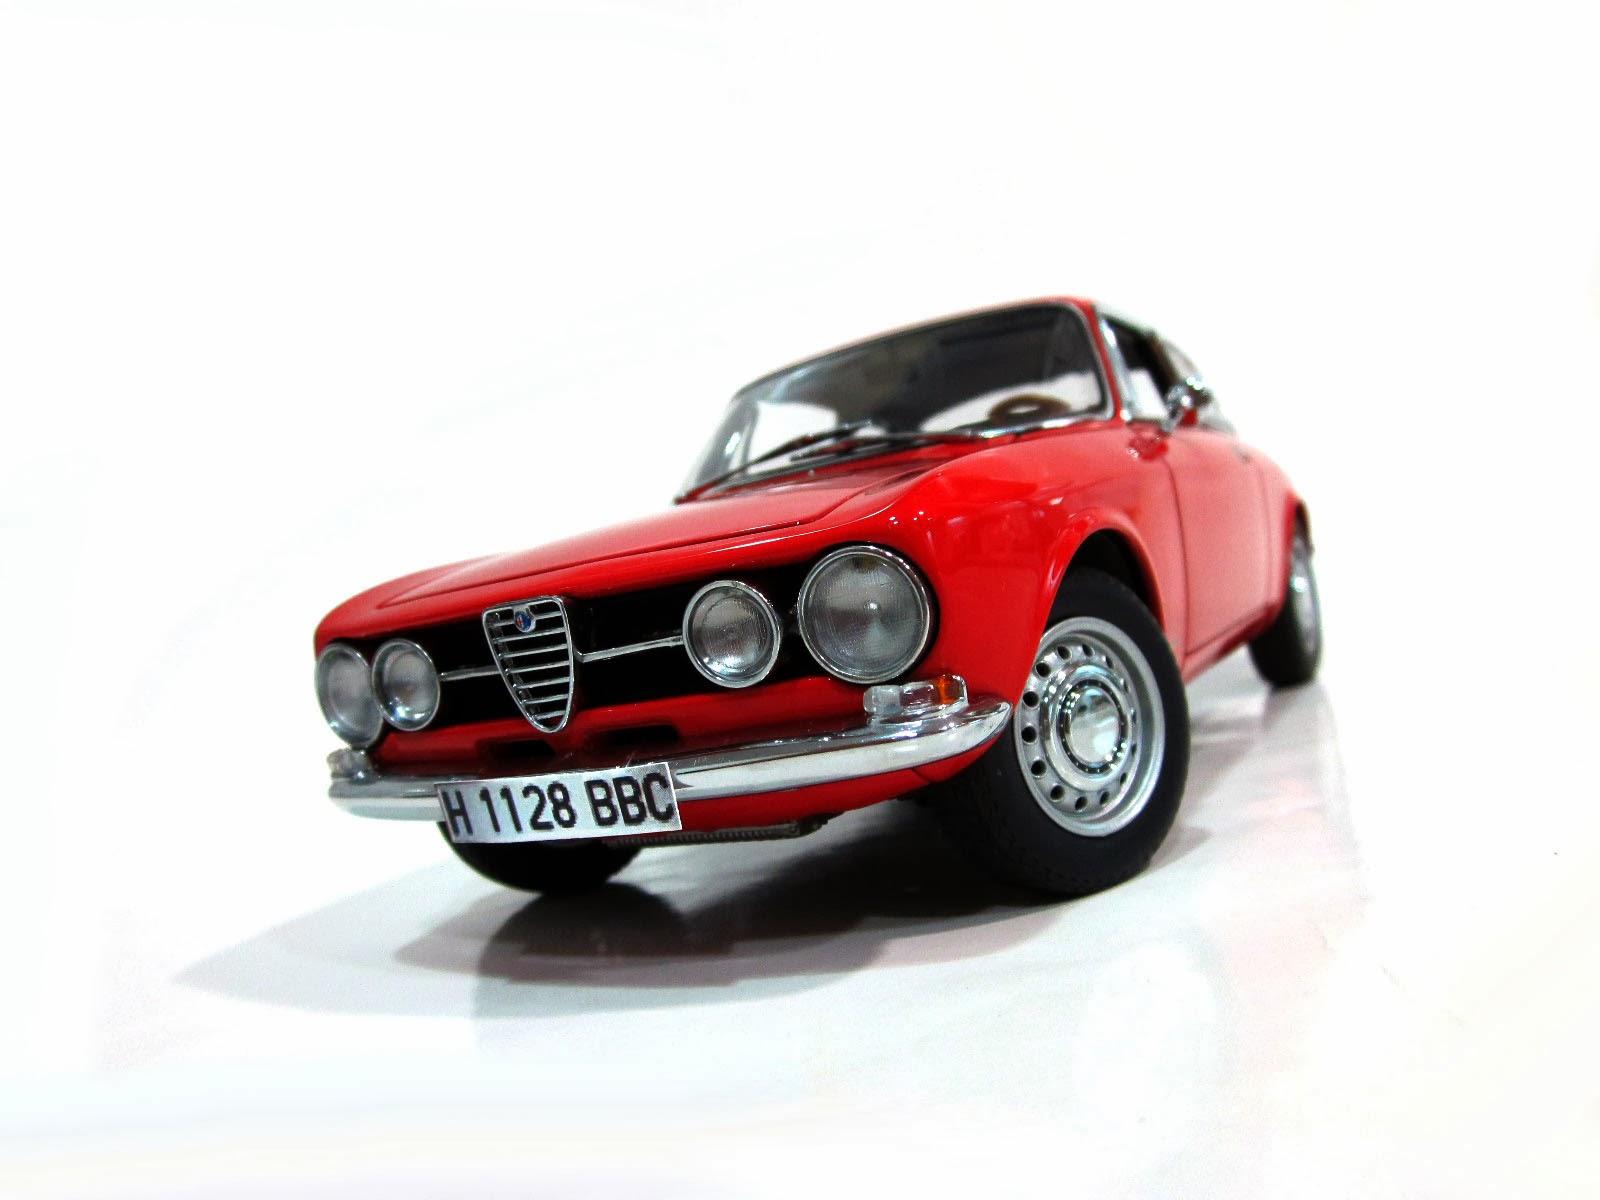 Alfa Romeo 1750 GTV '67 - AUTOart